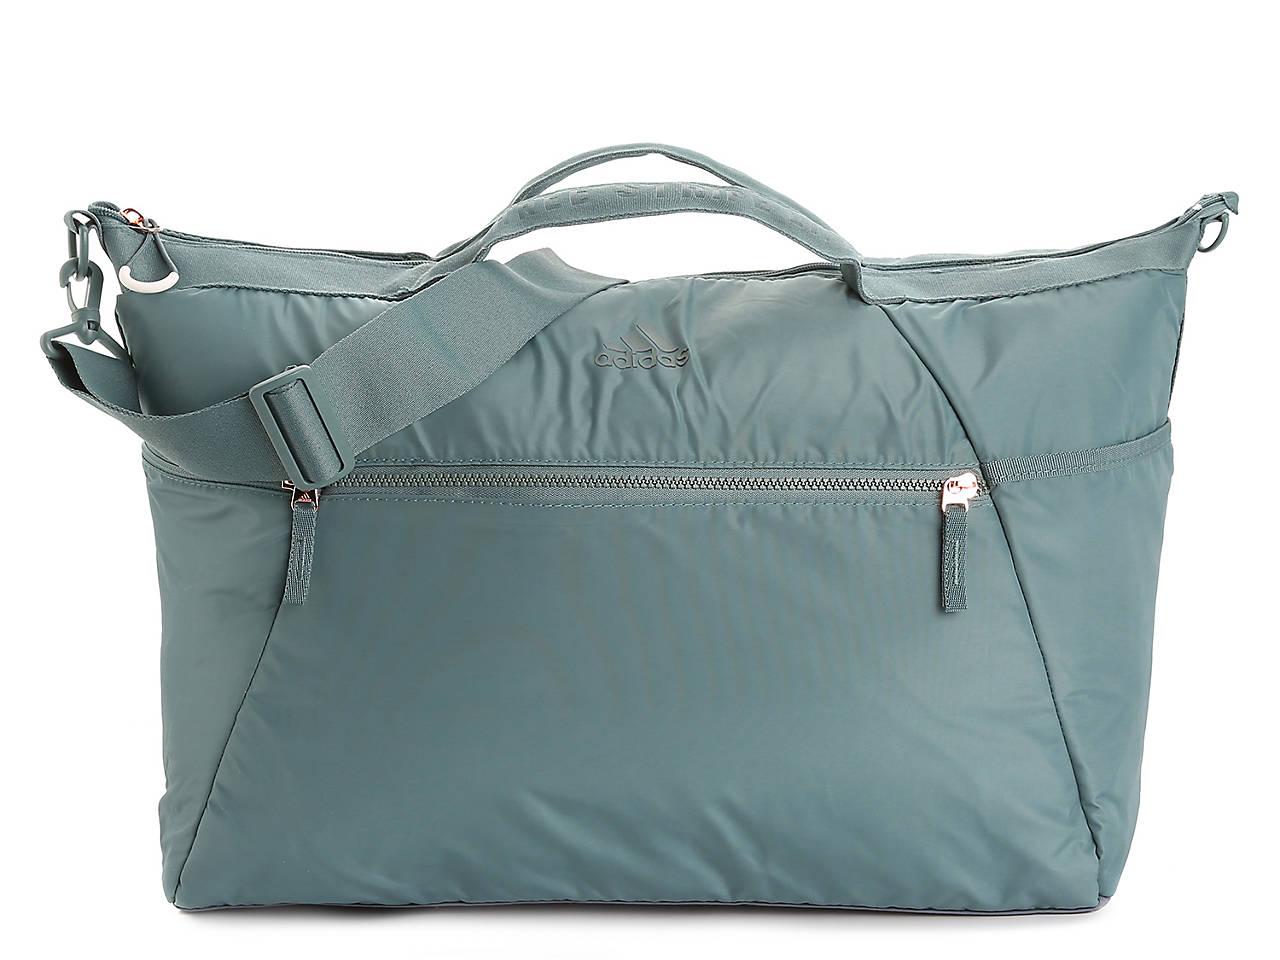 adidas Studio III Gym Bag Women s Handbags   Accessories  62b26dbb92529